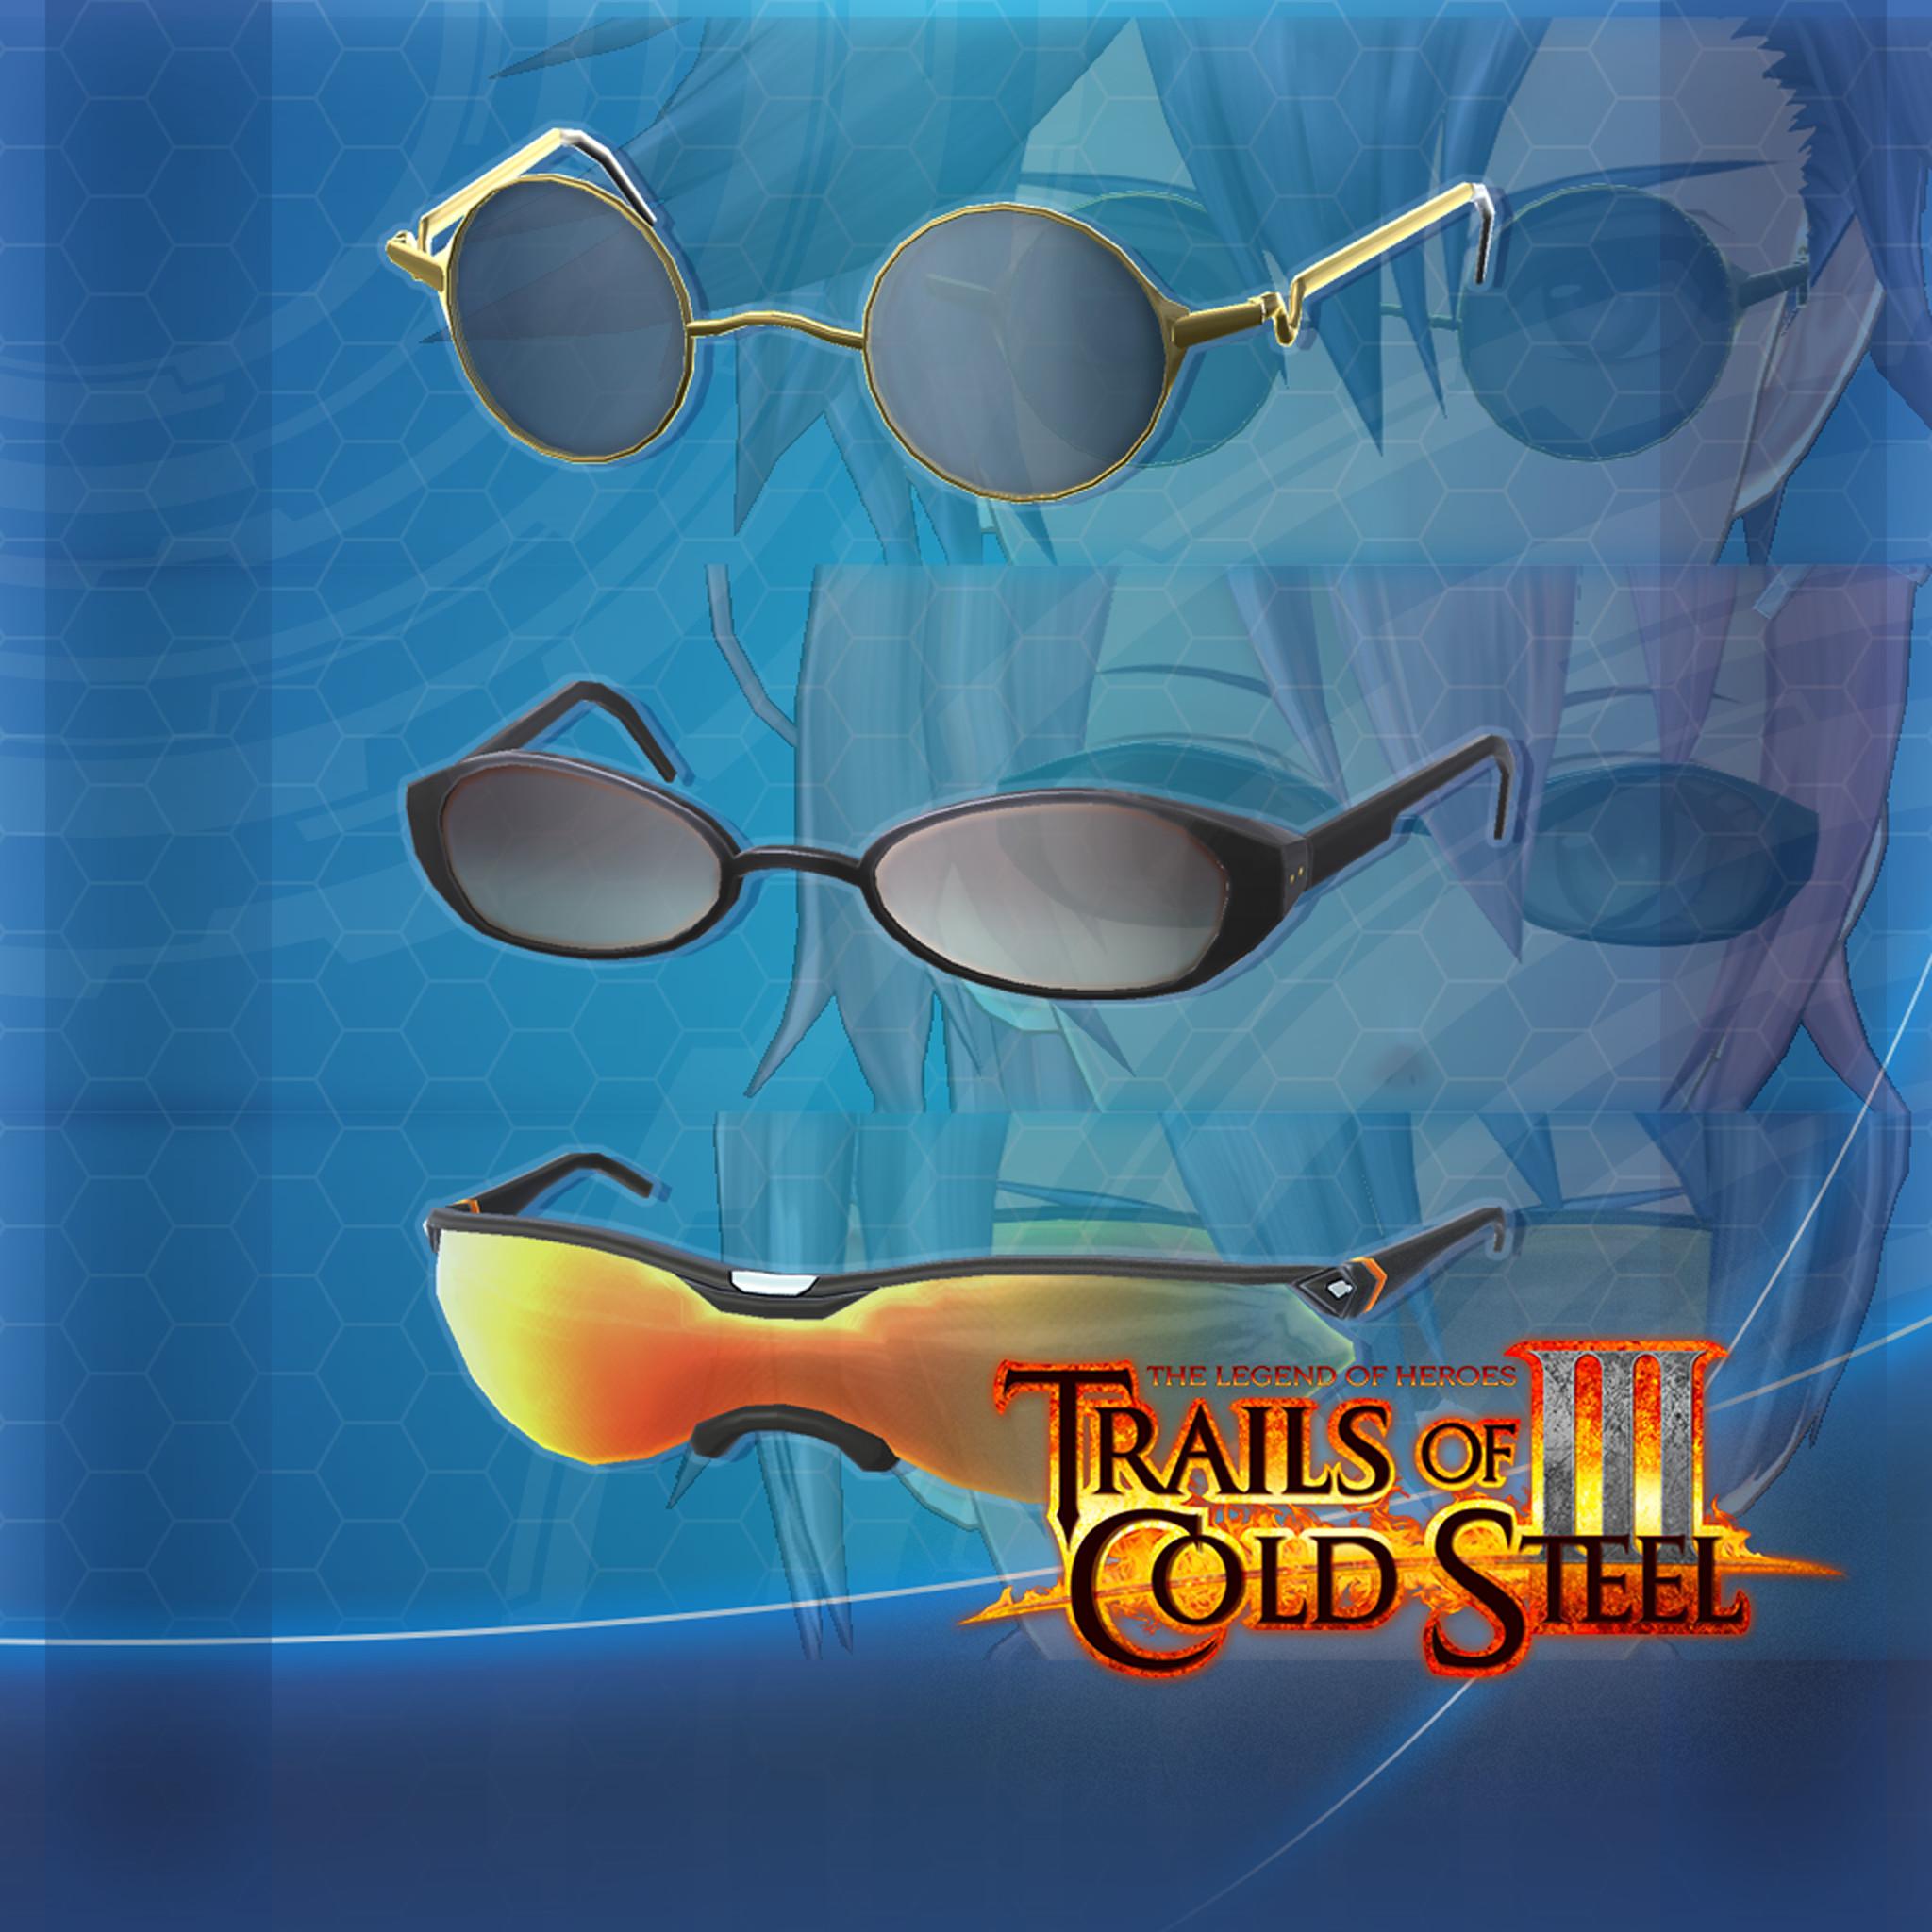 The Legend of Heroes: Trails of Cold Steel III  - Stylish Sunglasses Set screenshot